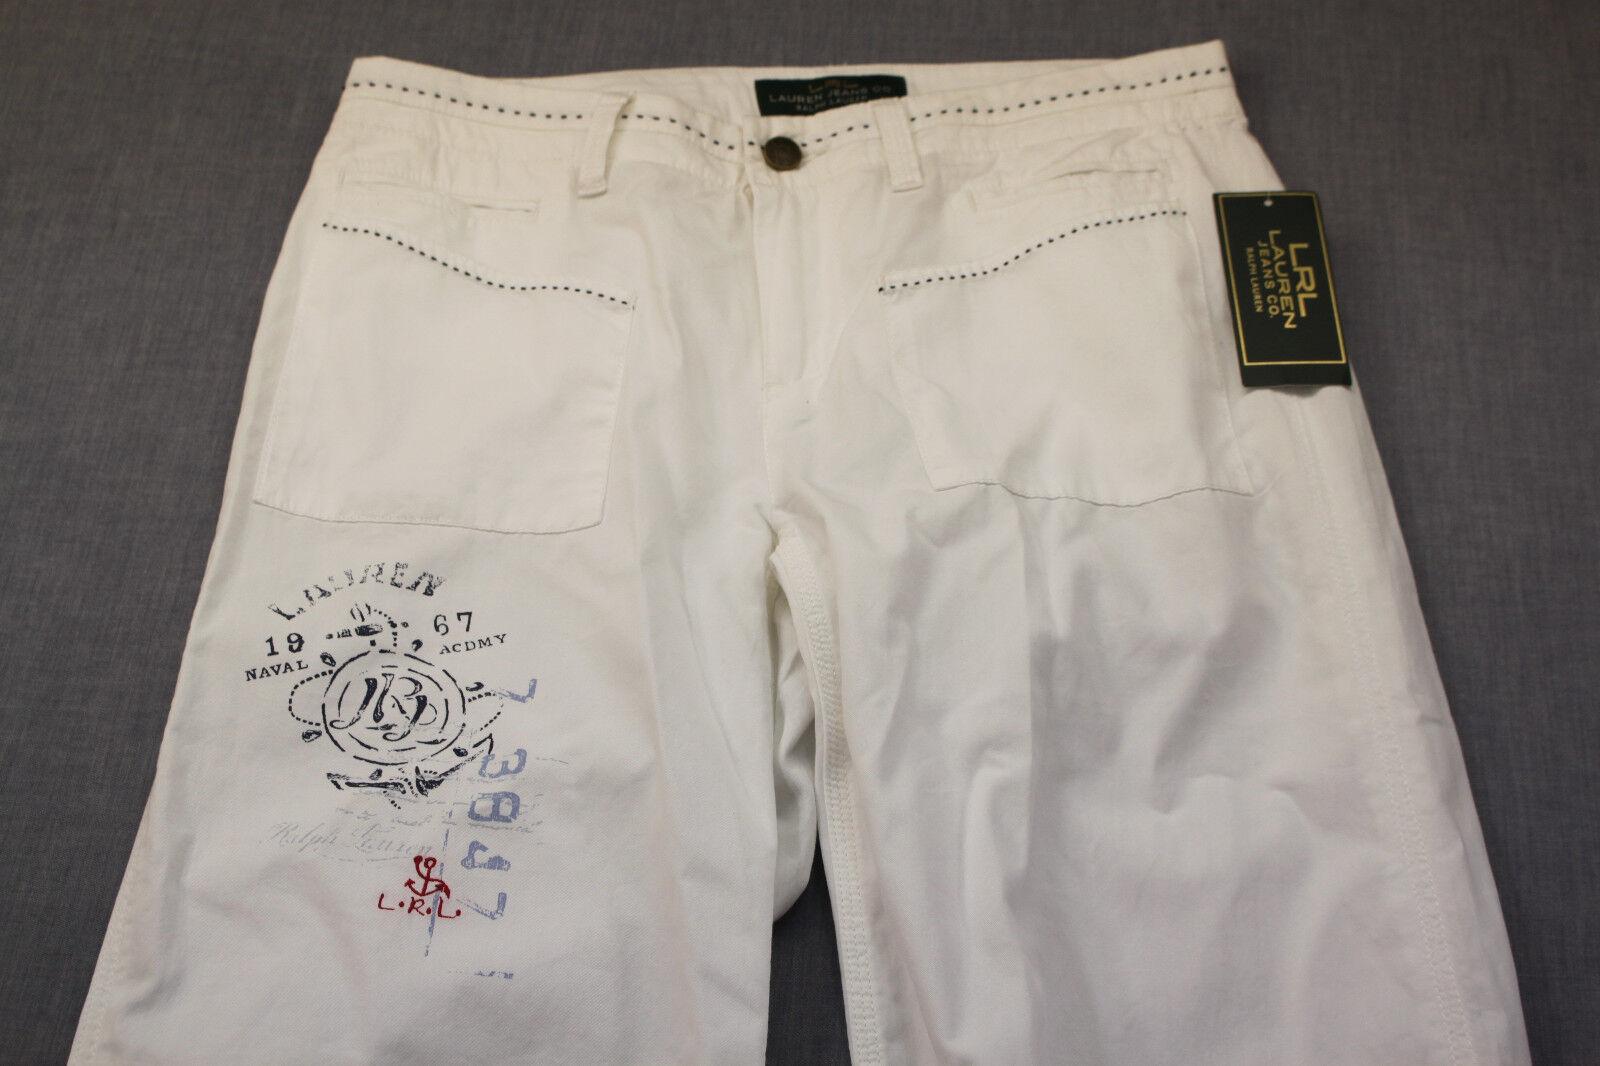 RALPH LAUREN Women White Naval Academy Print Embroidery Pants  4  30x31 NWT  109